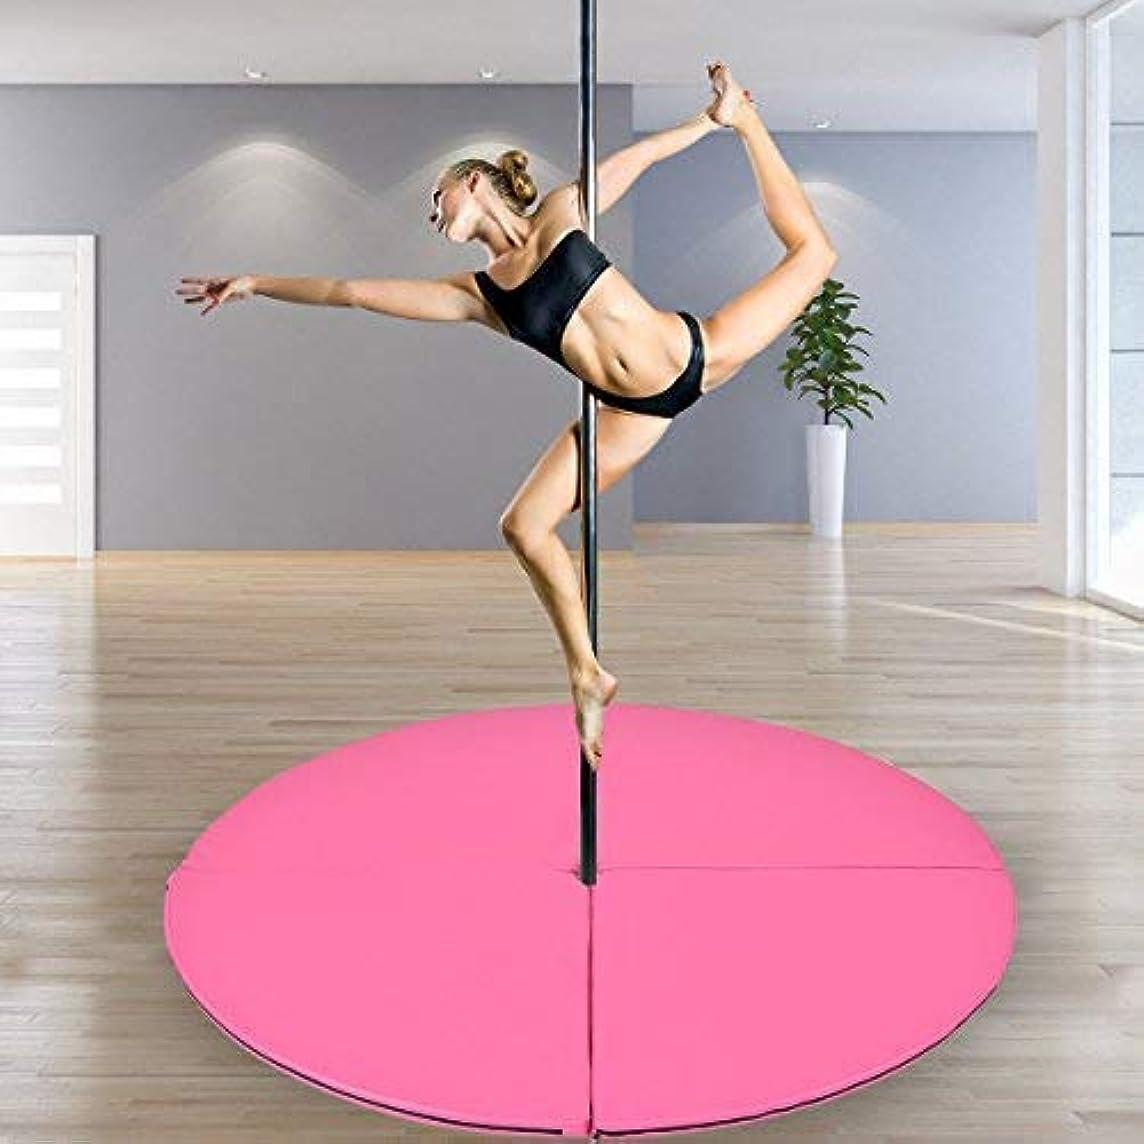 Tangkula Pole Dance Mat Foldable Yoga Exercise Safety Dancing Cushion Steel Pipe Crash Mat, Dia 5ft x 2